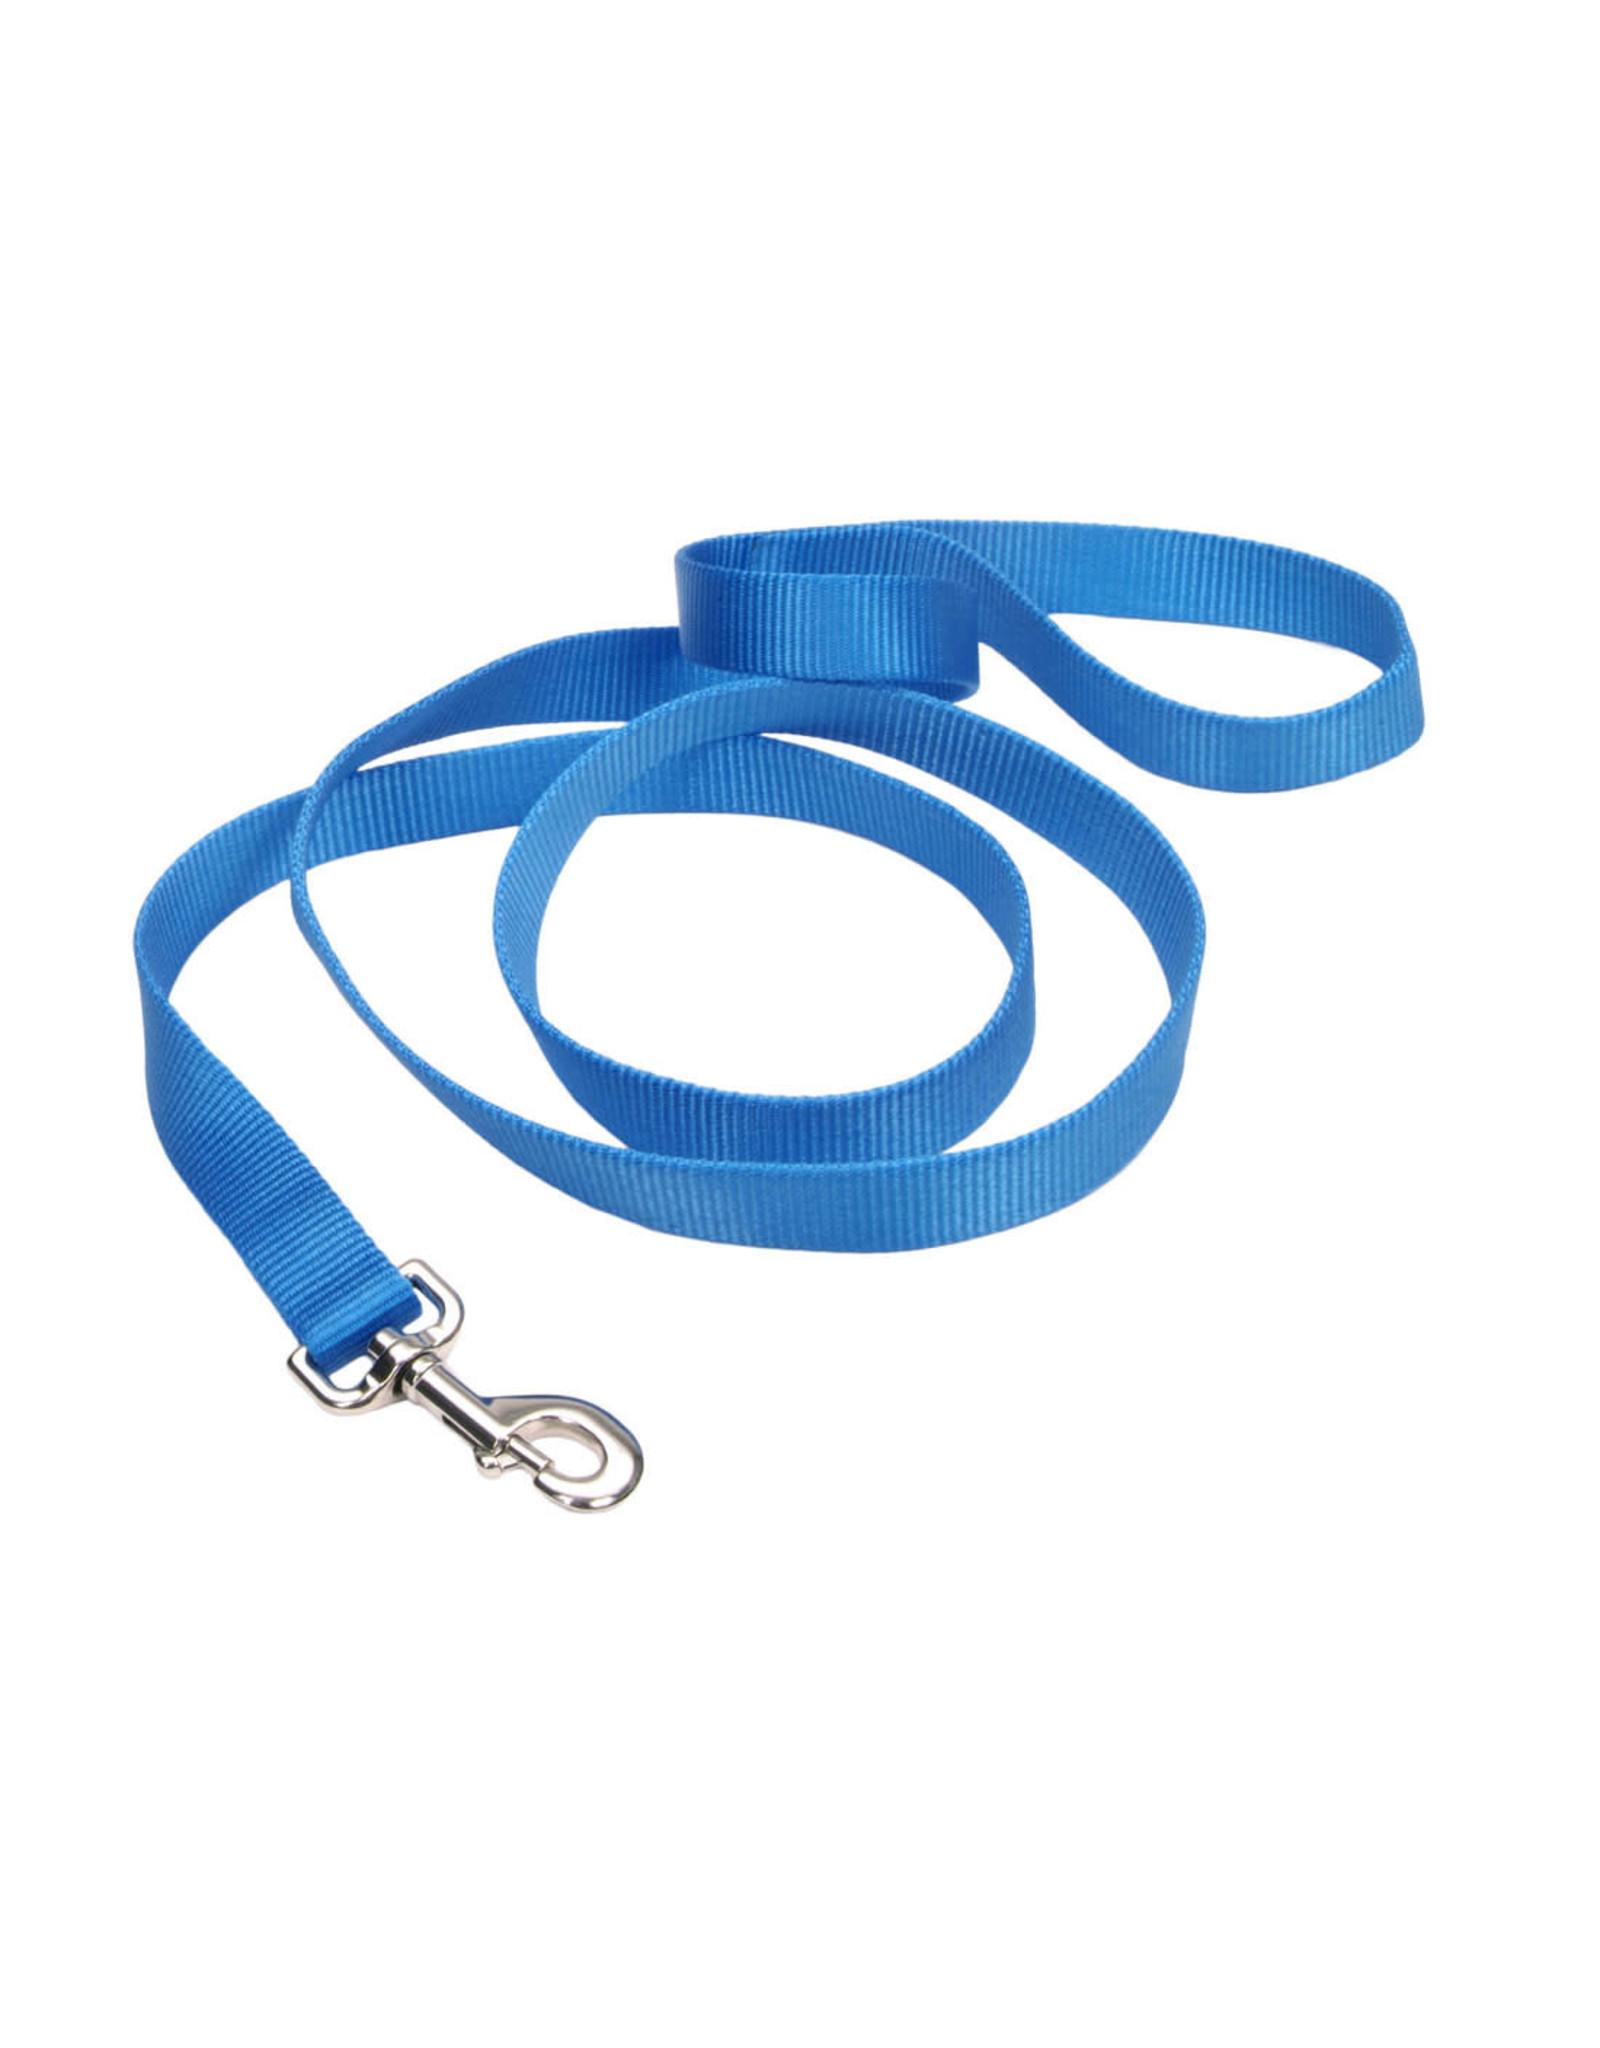 Coastal Pet Products Coastal Single-Ply Leash 6'